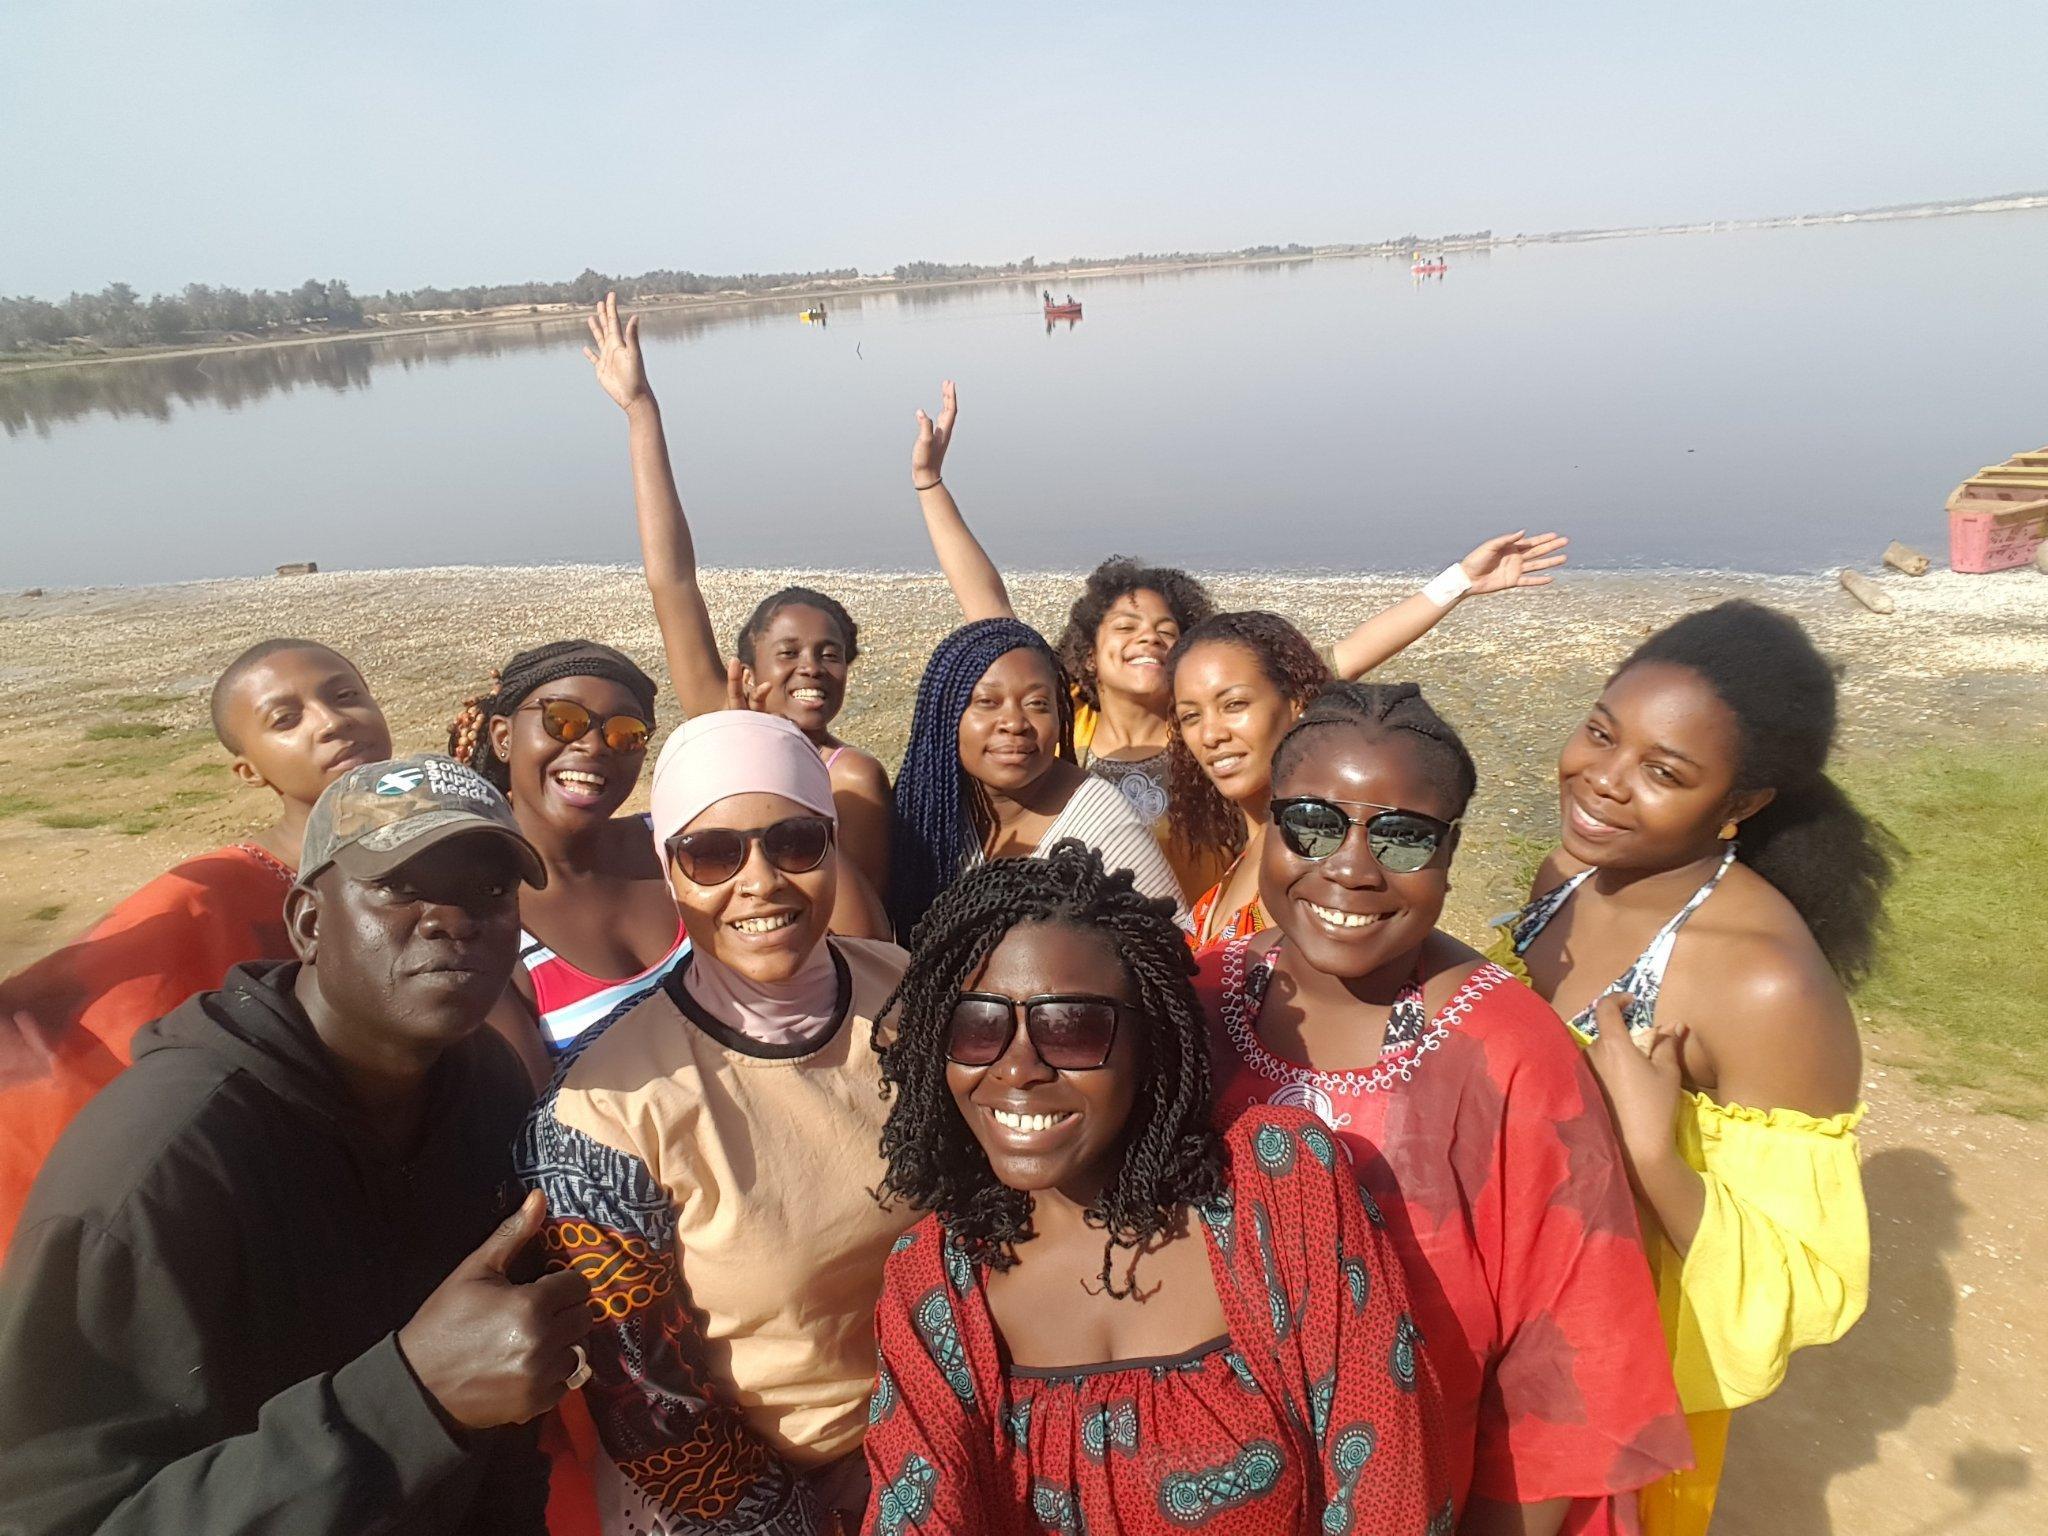 we-sisterhood-dakar-27-lac-rose-retba-selfie-groupe-femmes-noires